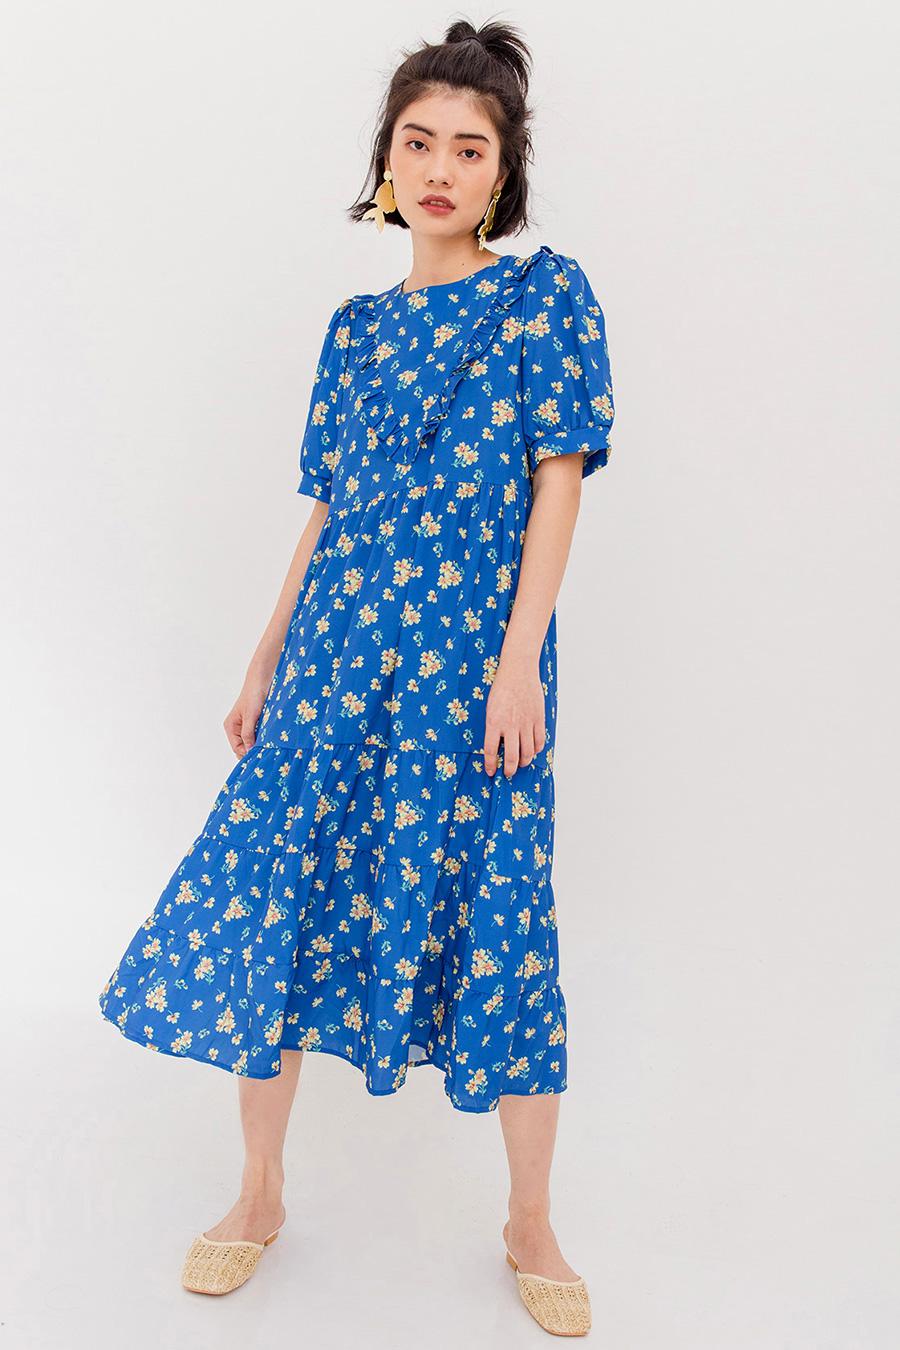 GERDA FLORAL RUFFLE DRESS - BLUE